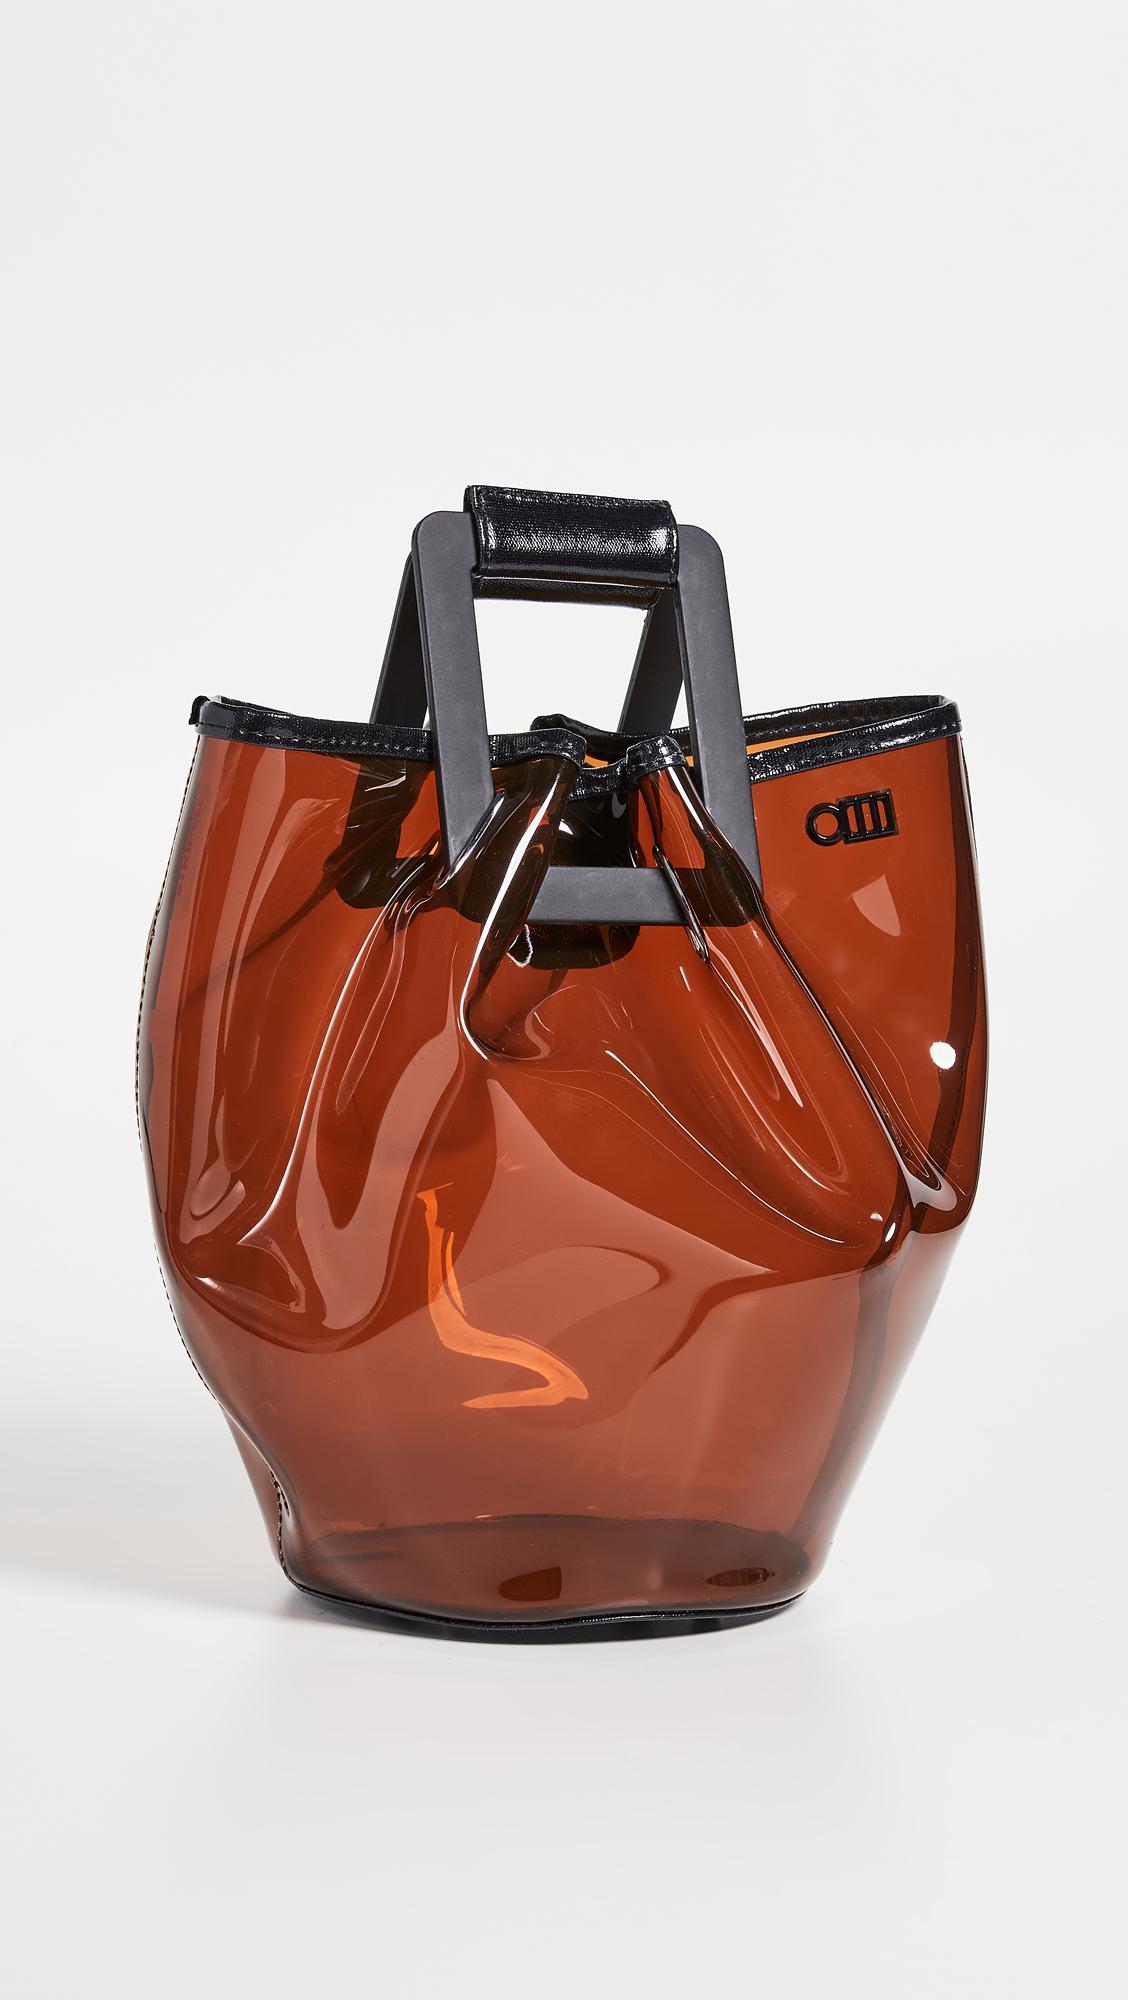 The Cassie Bag